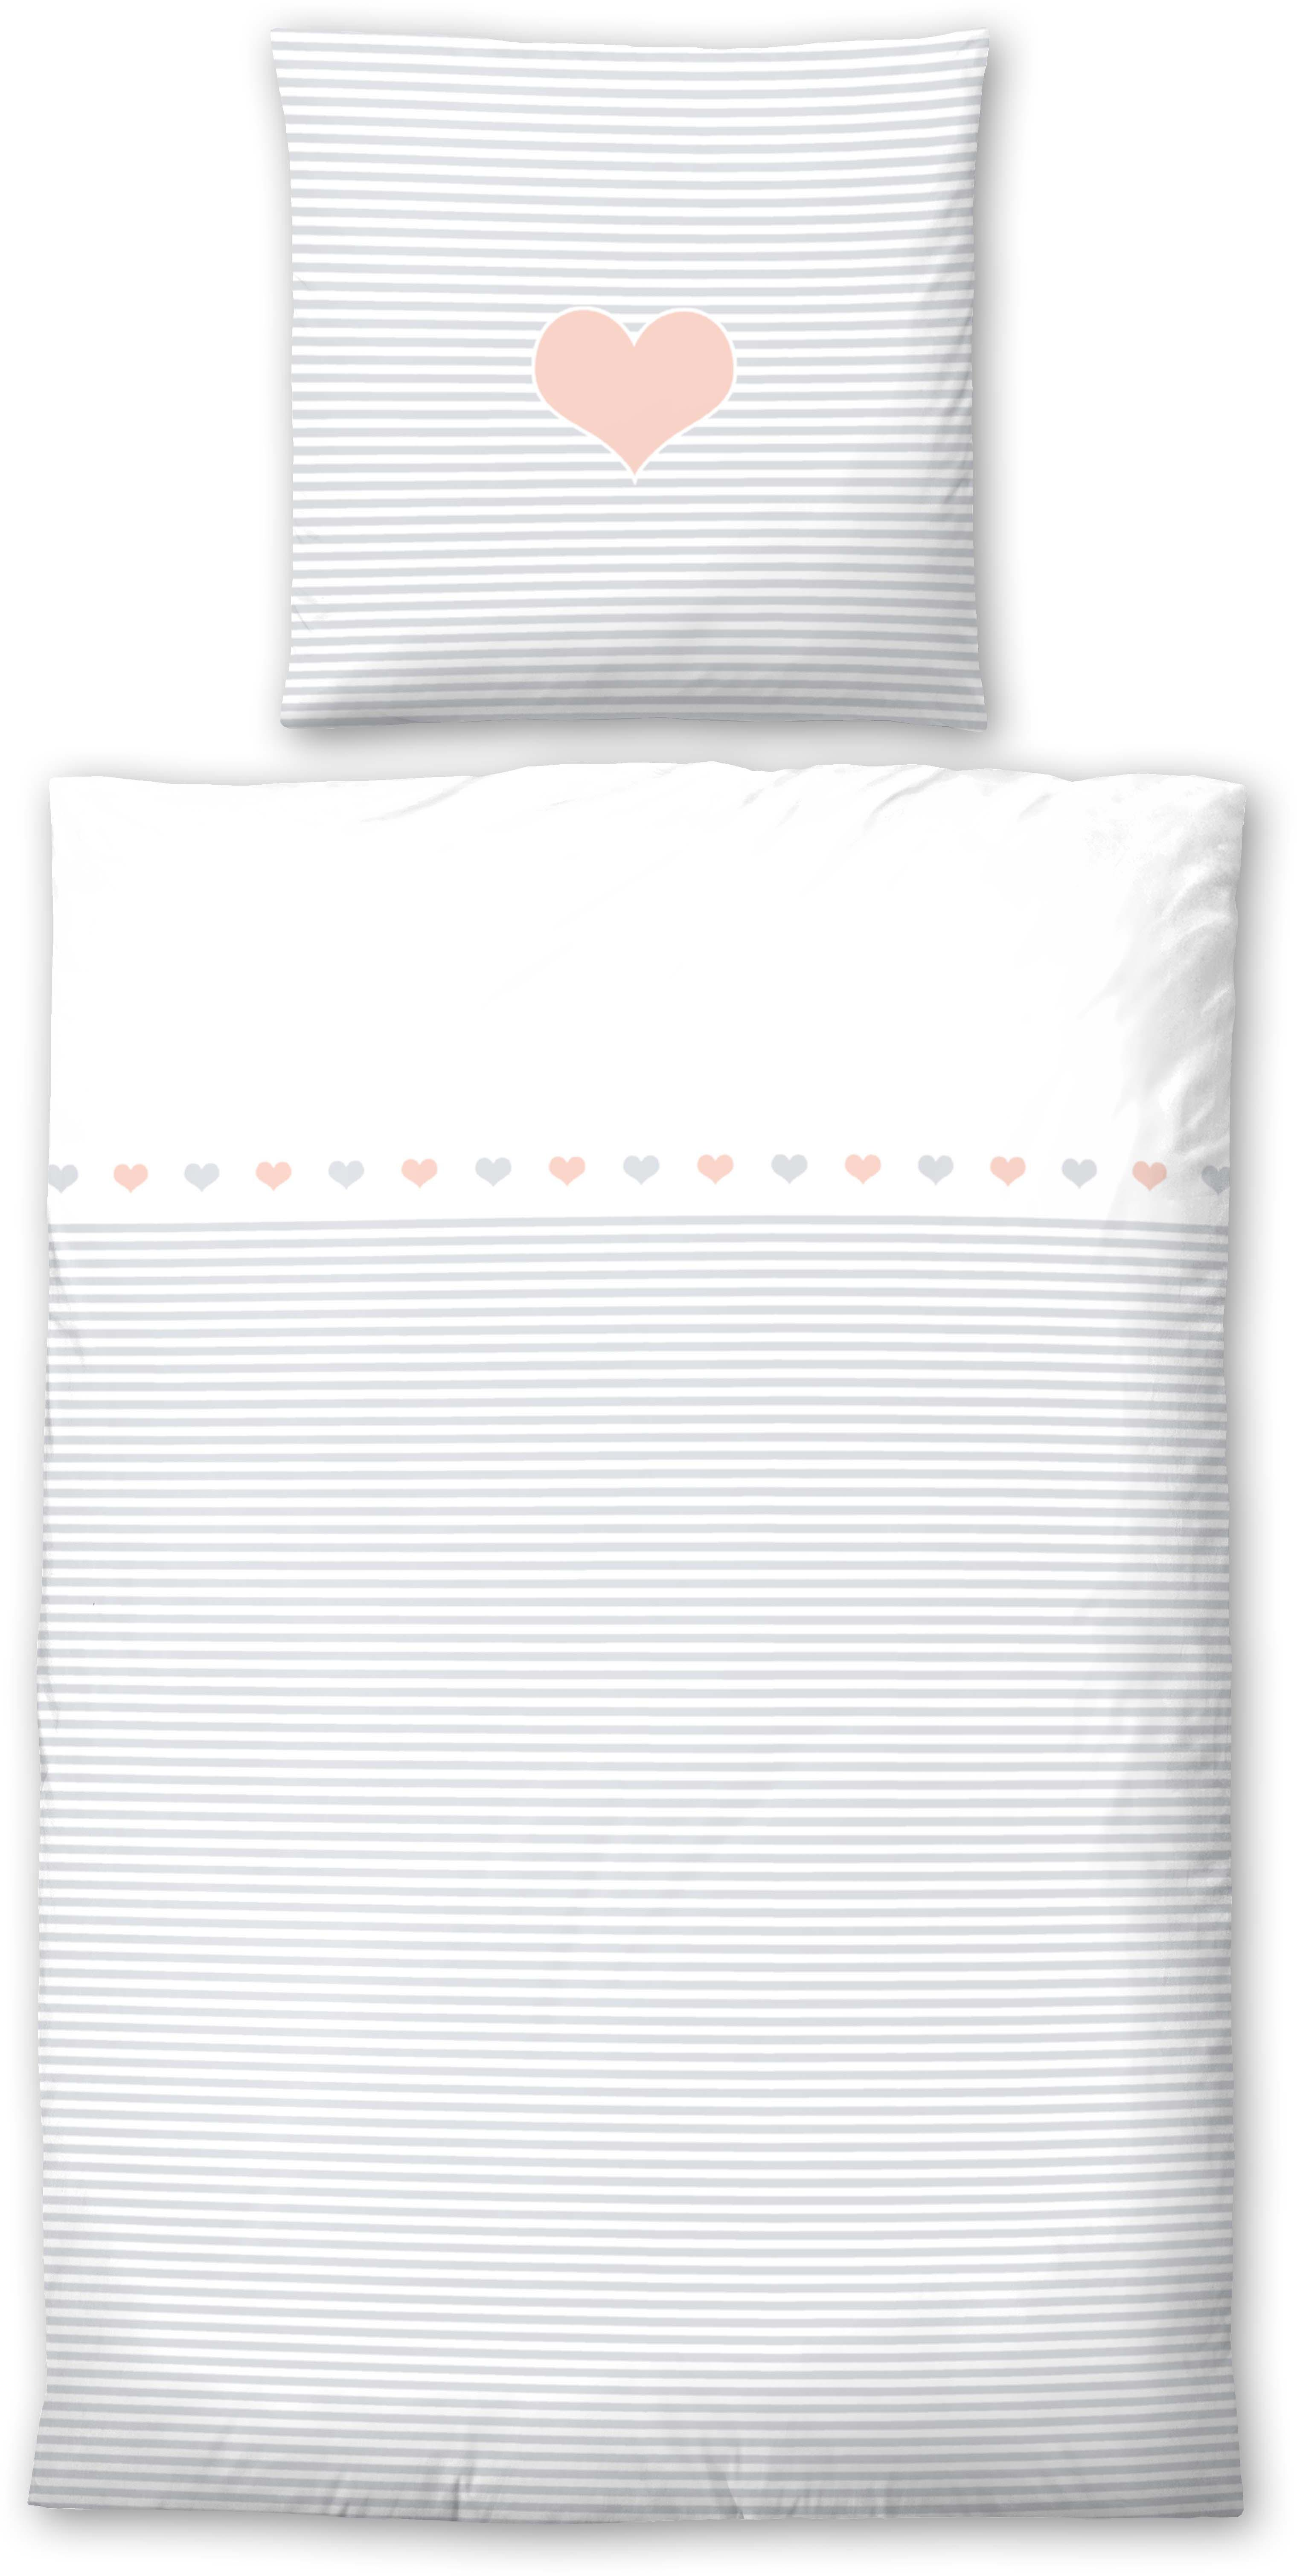 Kinderbettwäsche Striped Heart Biberna